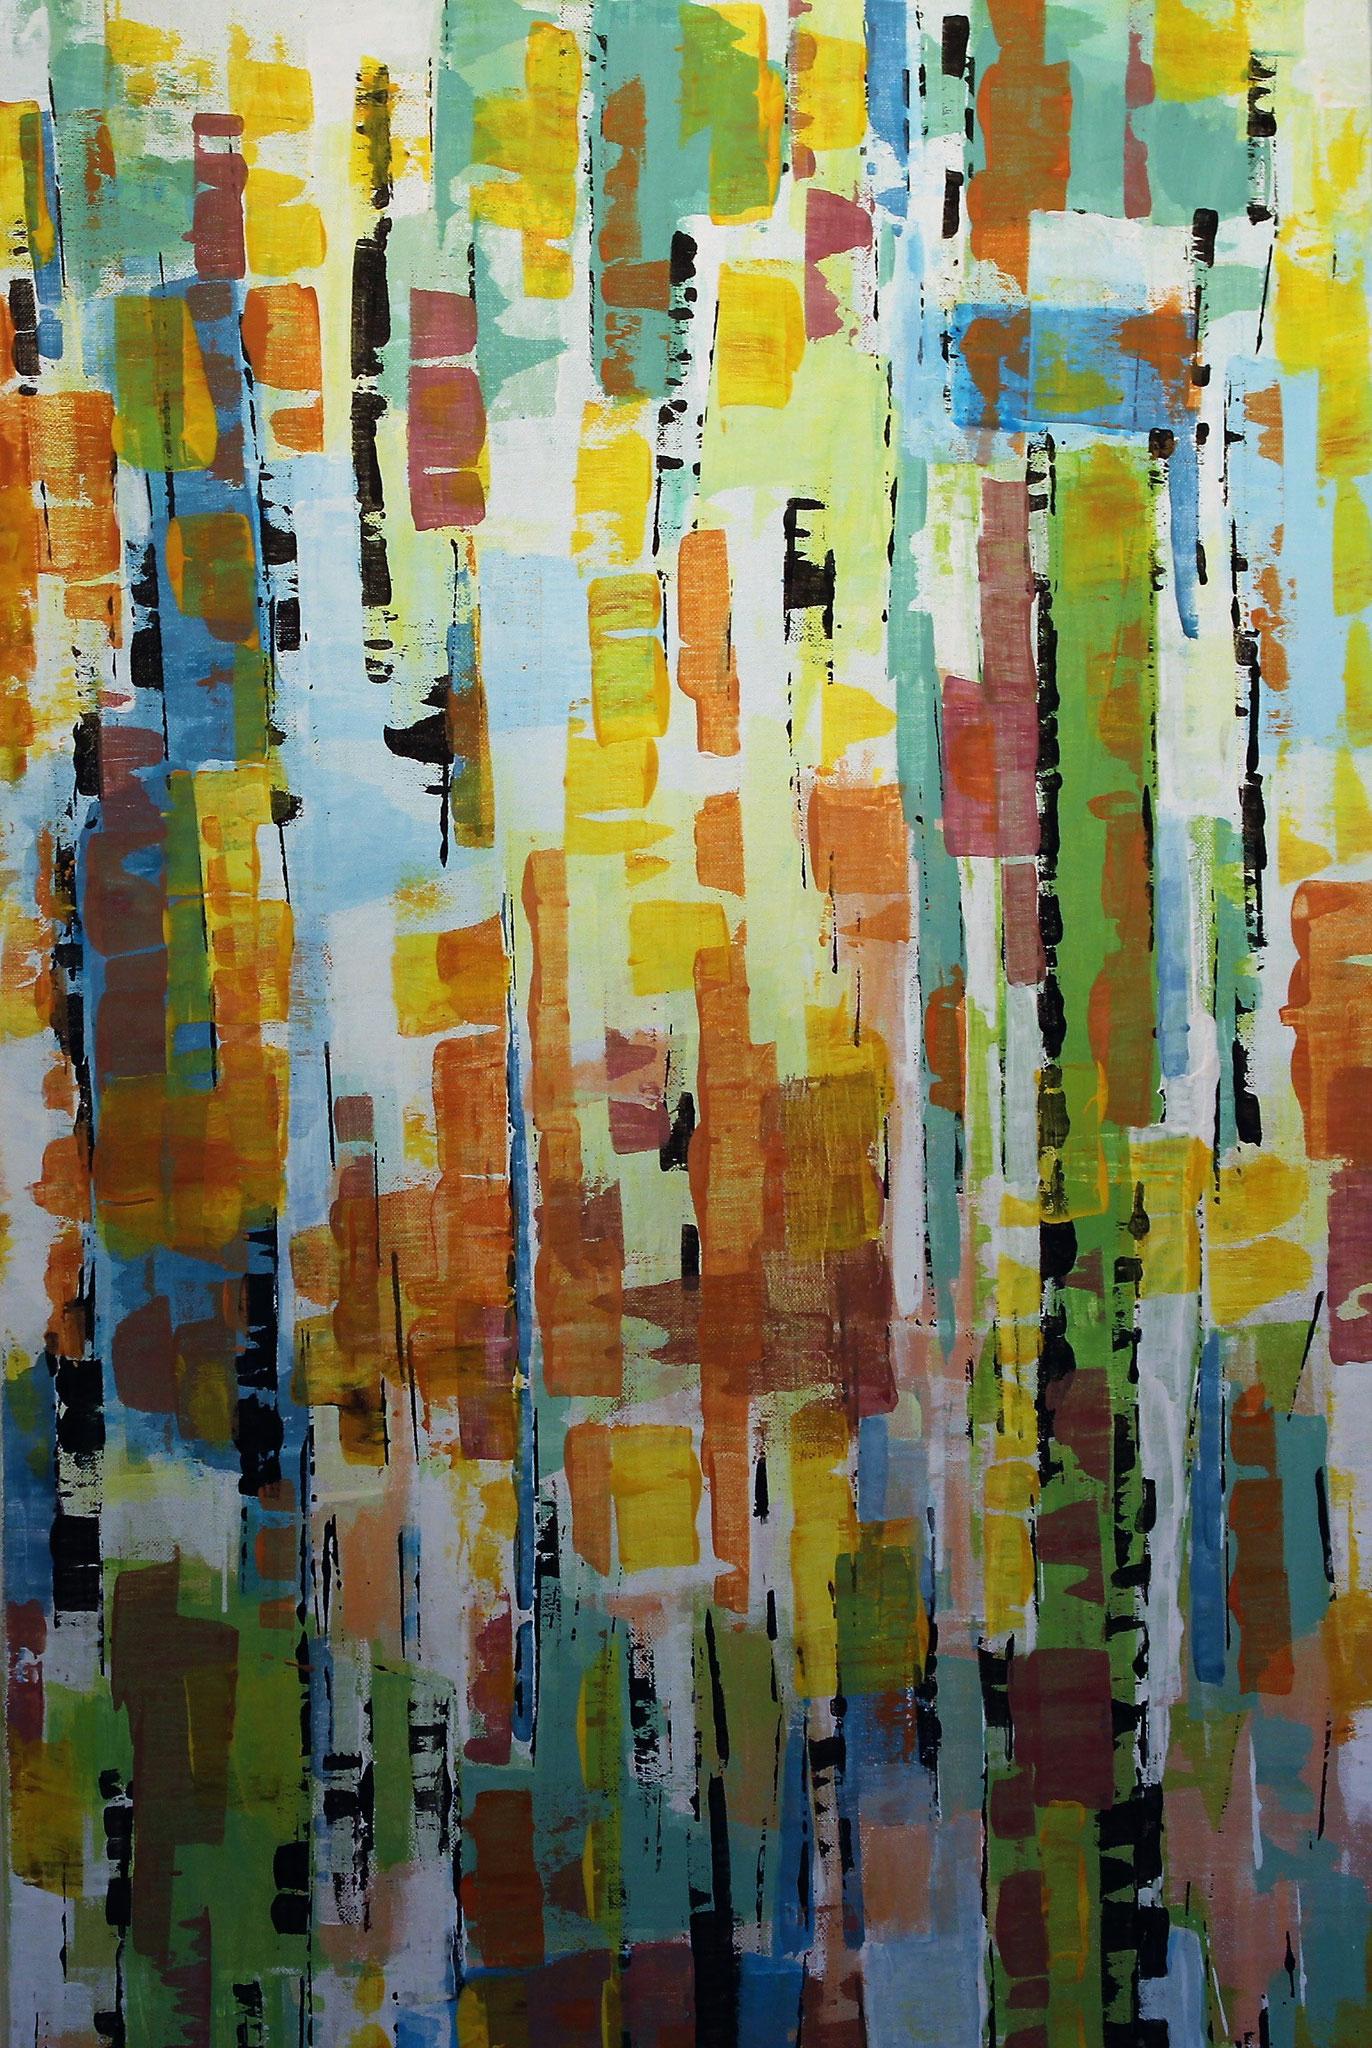 Farbkomposition in Gelb (100 x 50cm)